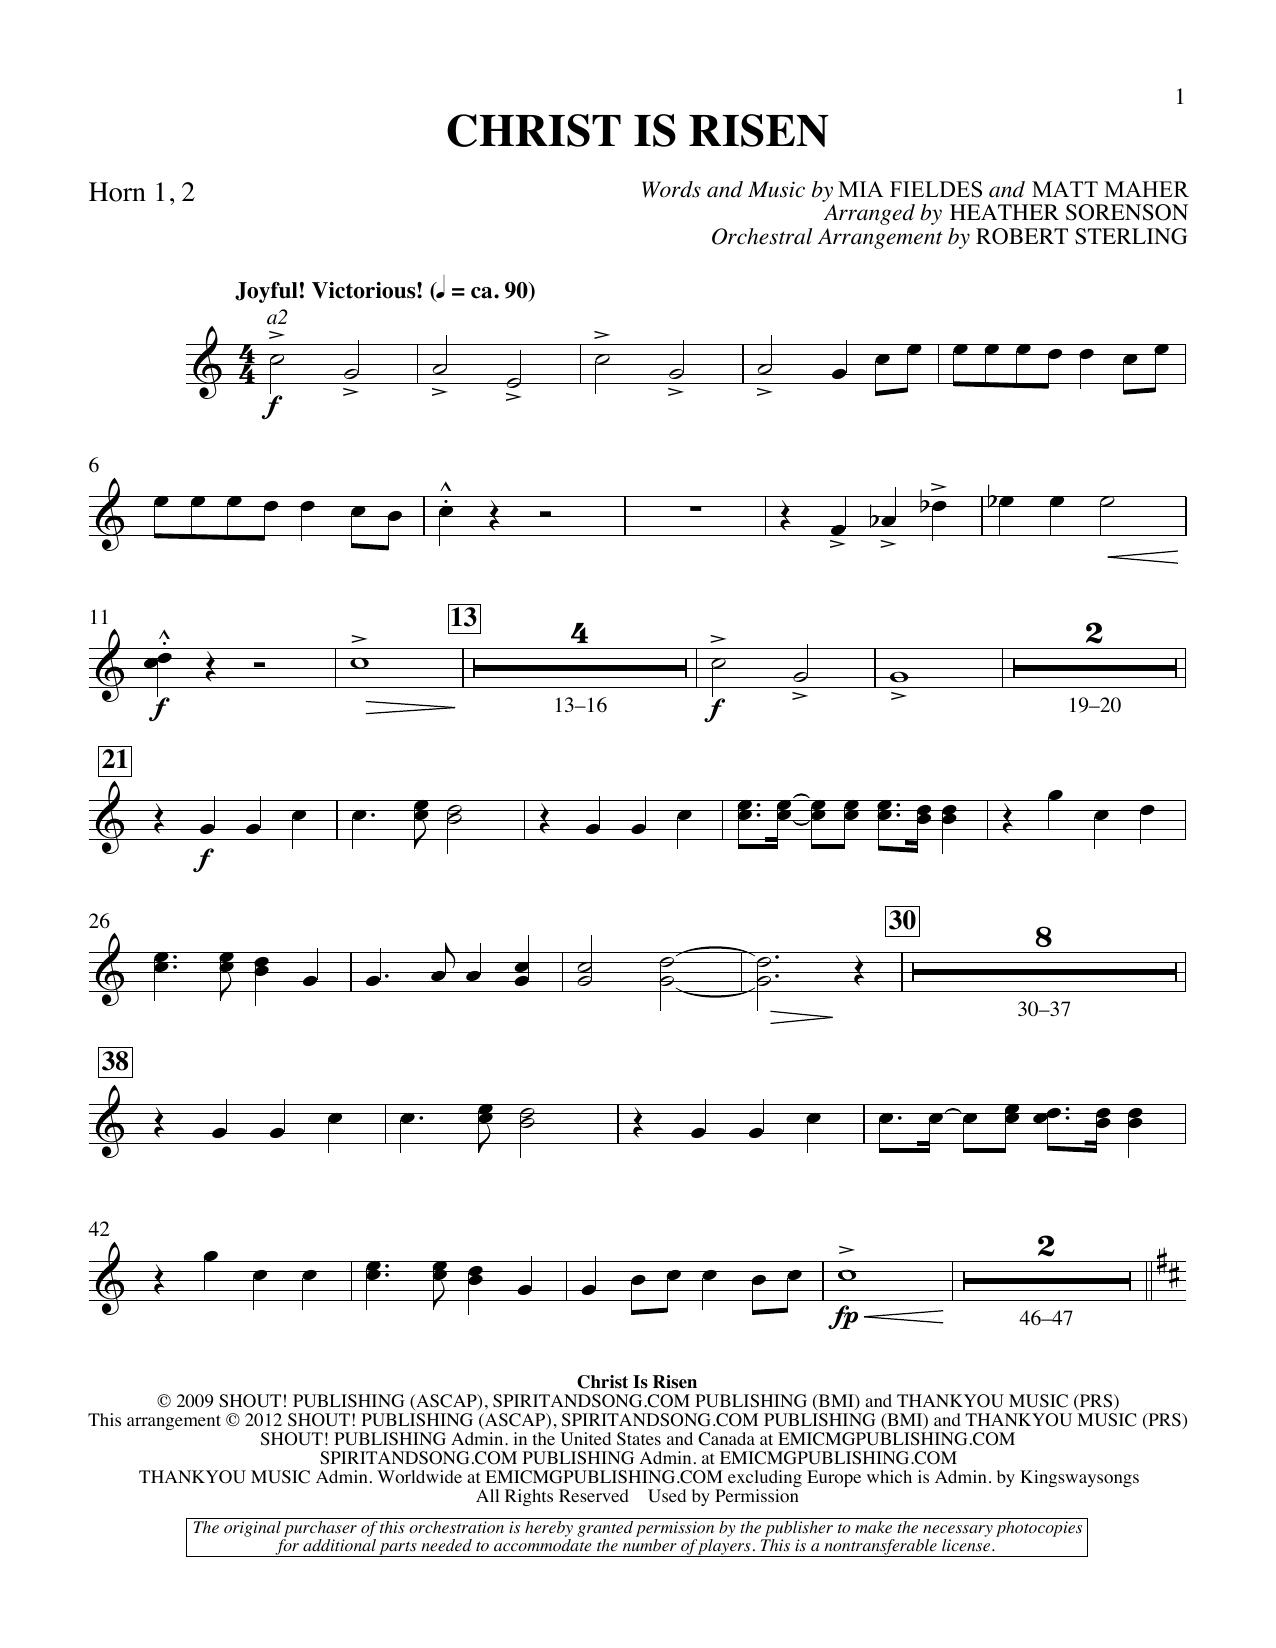 The Beautiful Christ (An Easter Celebration Of Grace) - F Horn 1,2 Sheet Music